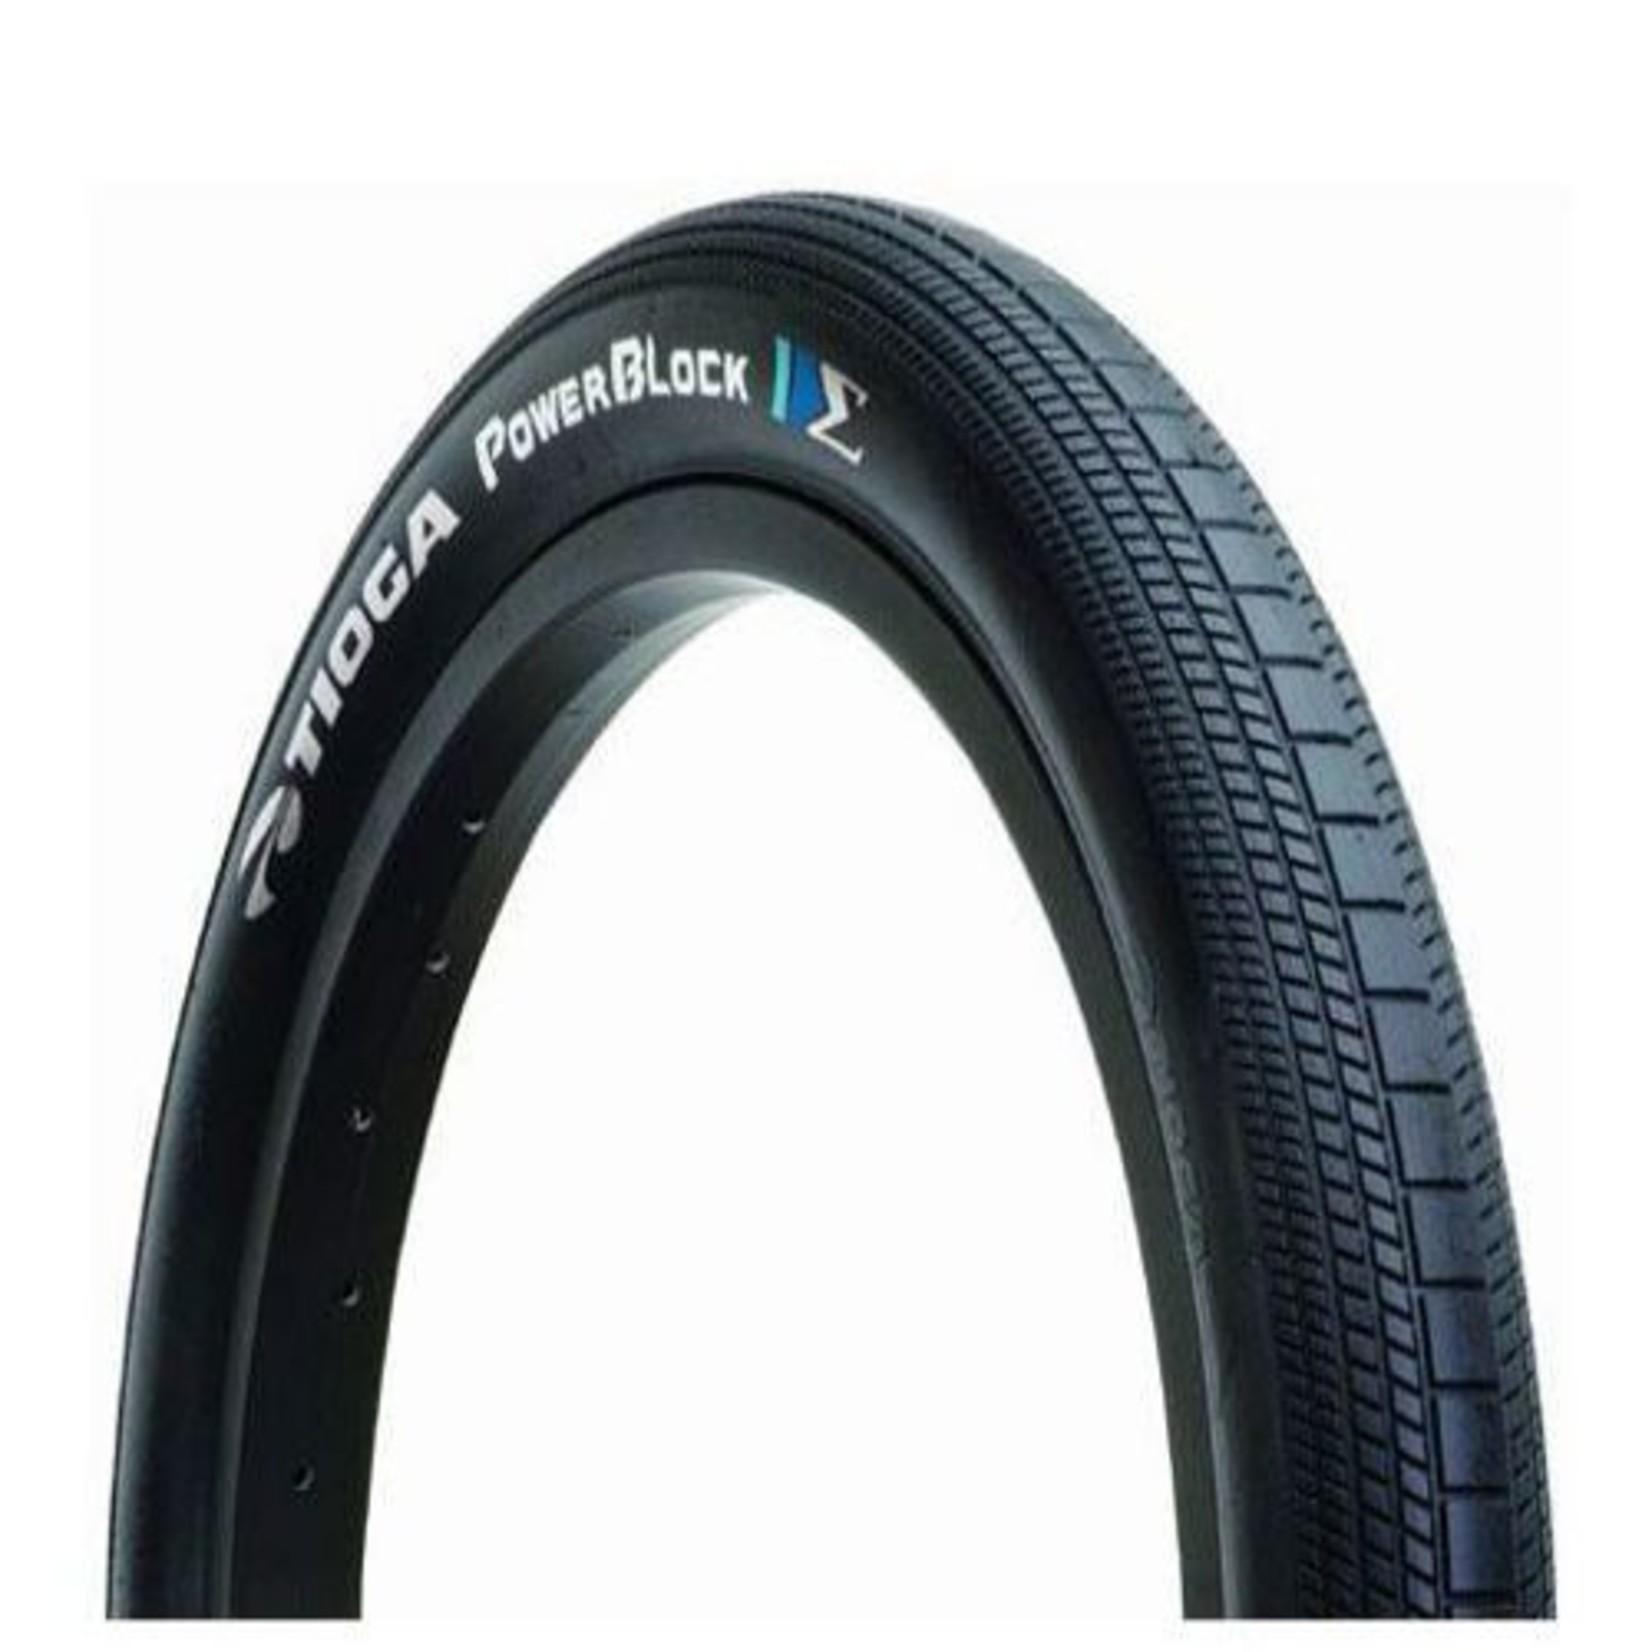 Tioga Tioga Tires RP Powerblock SSpec Black